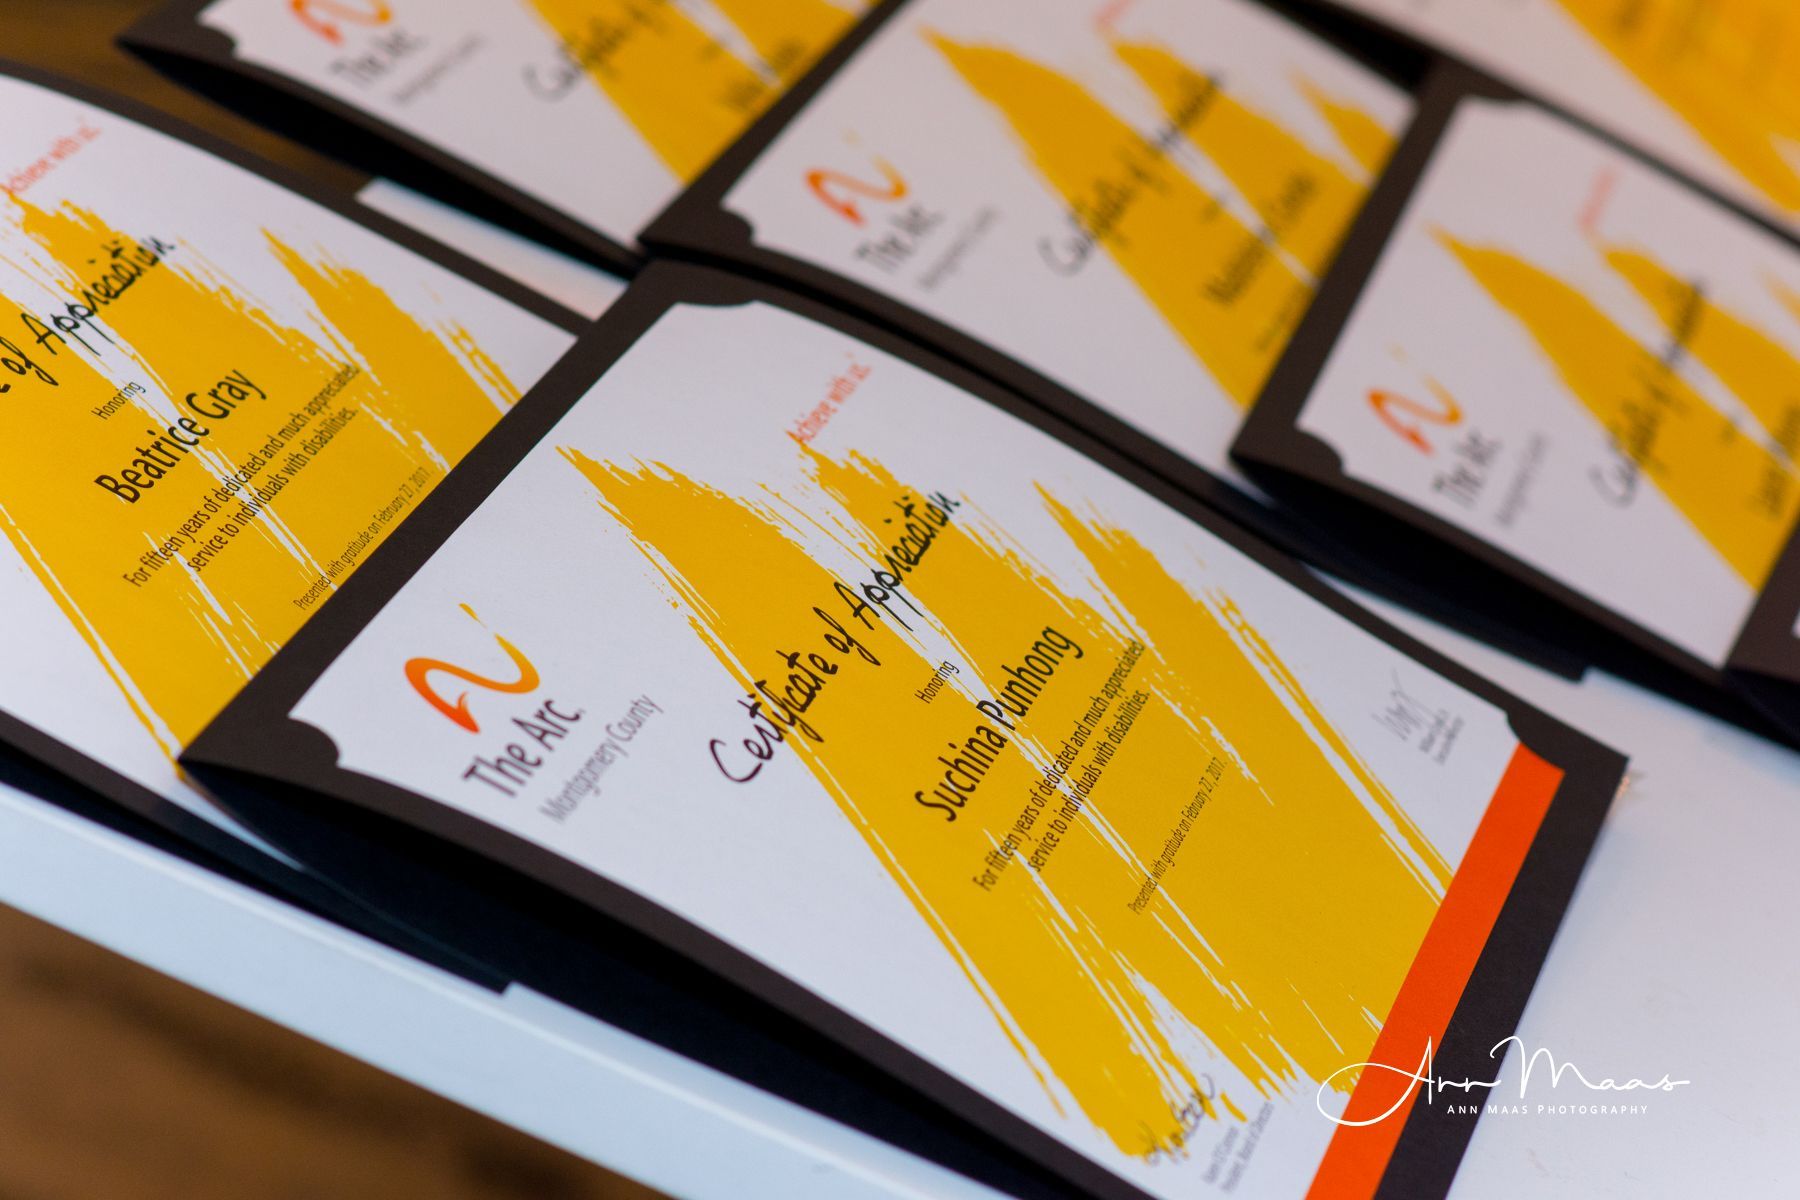 2017 Community, Staff & Volunteer Awards Ceremony